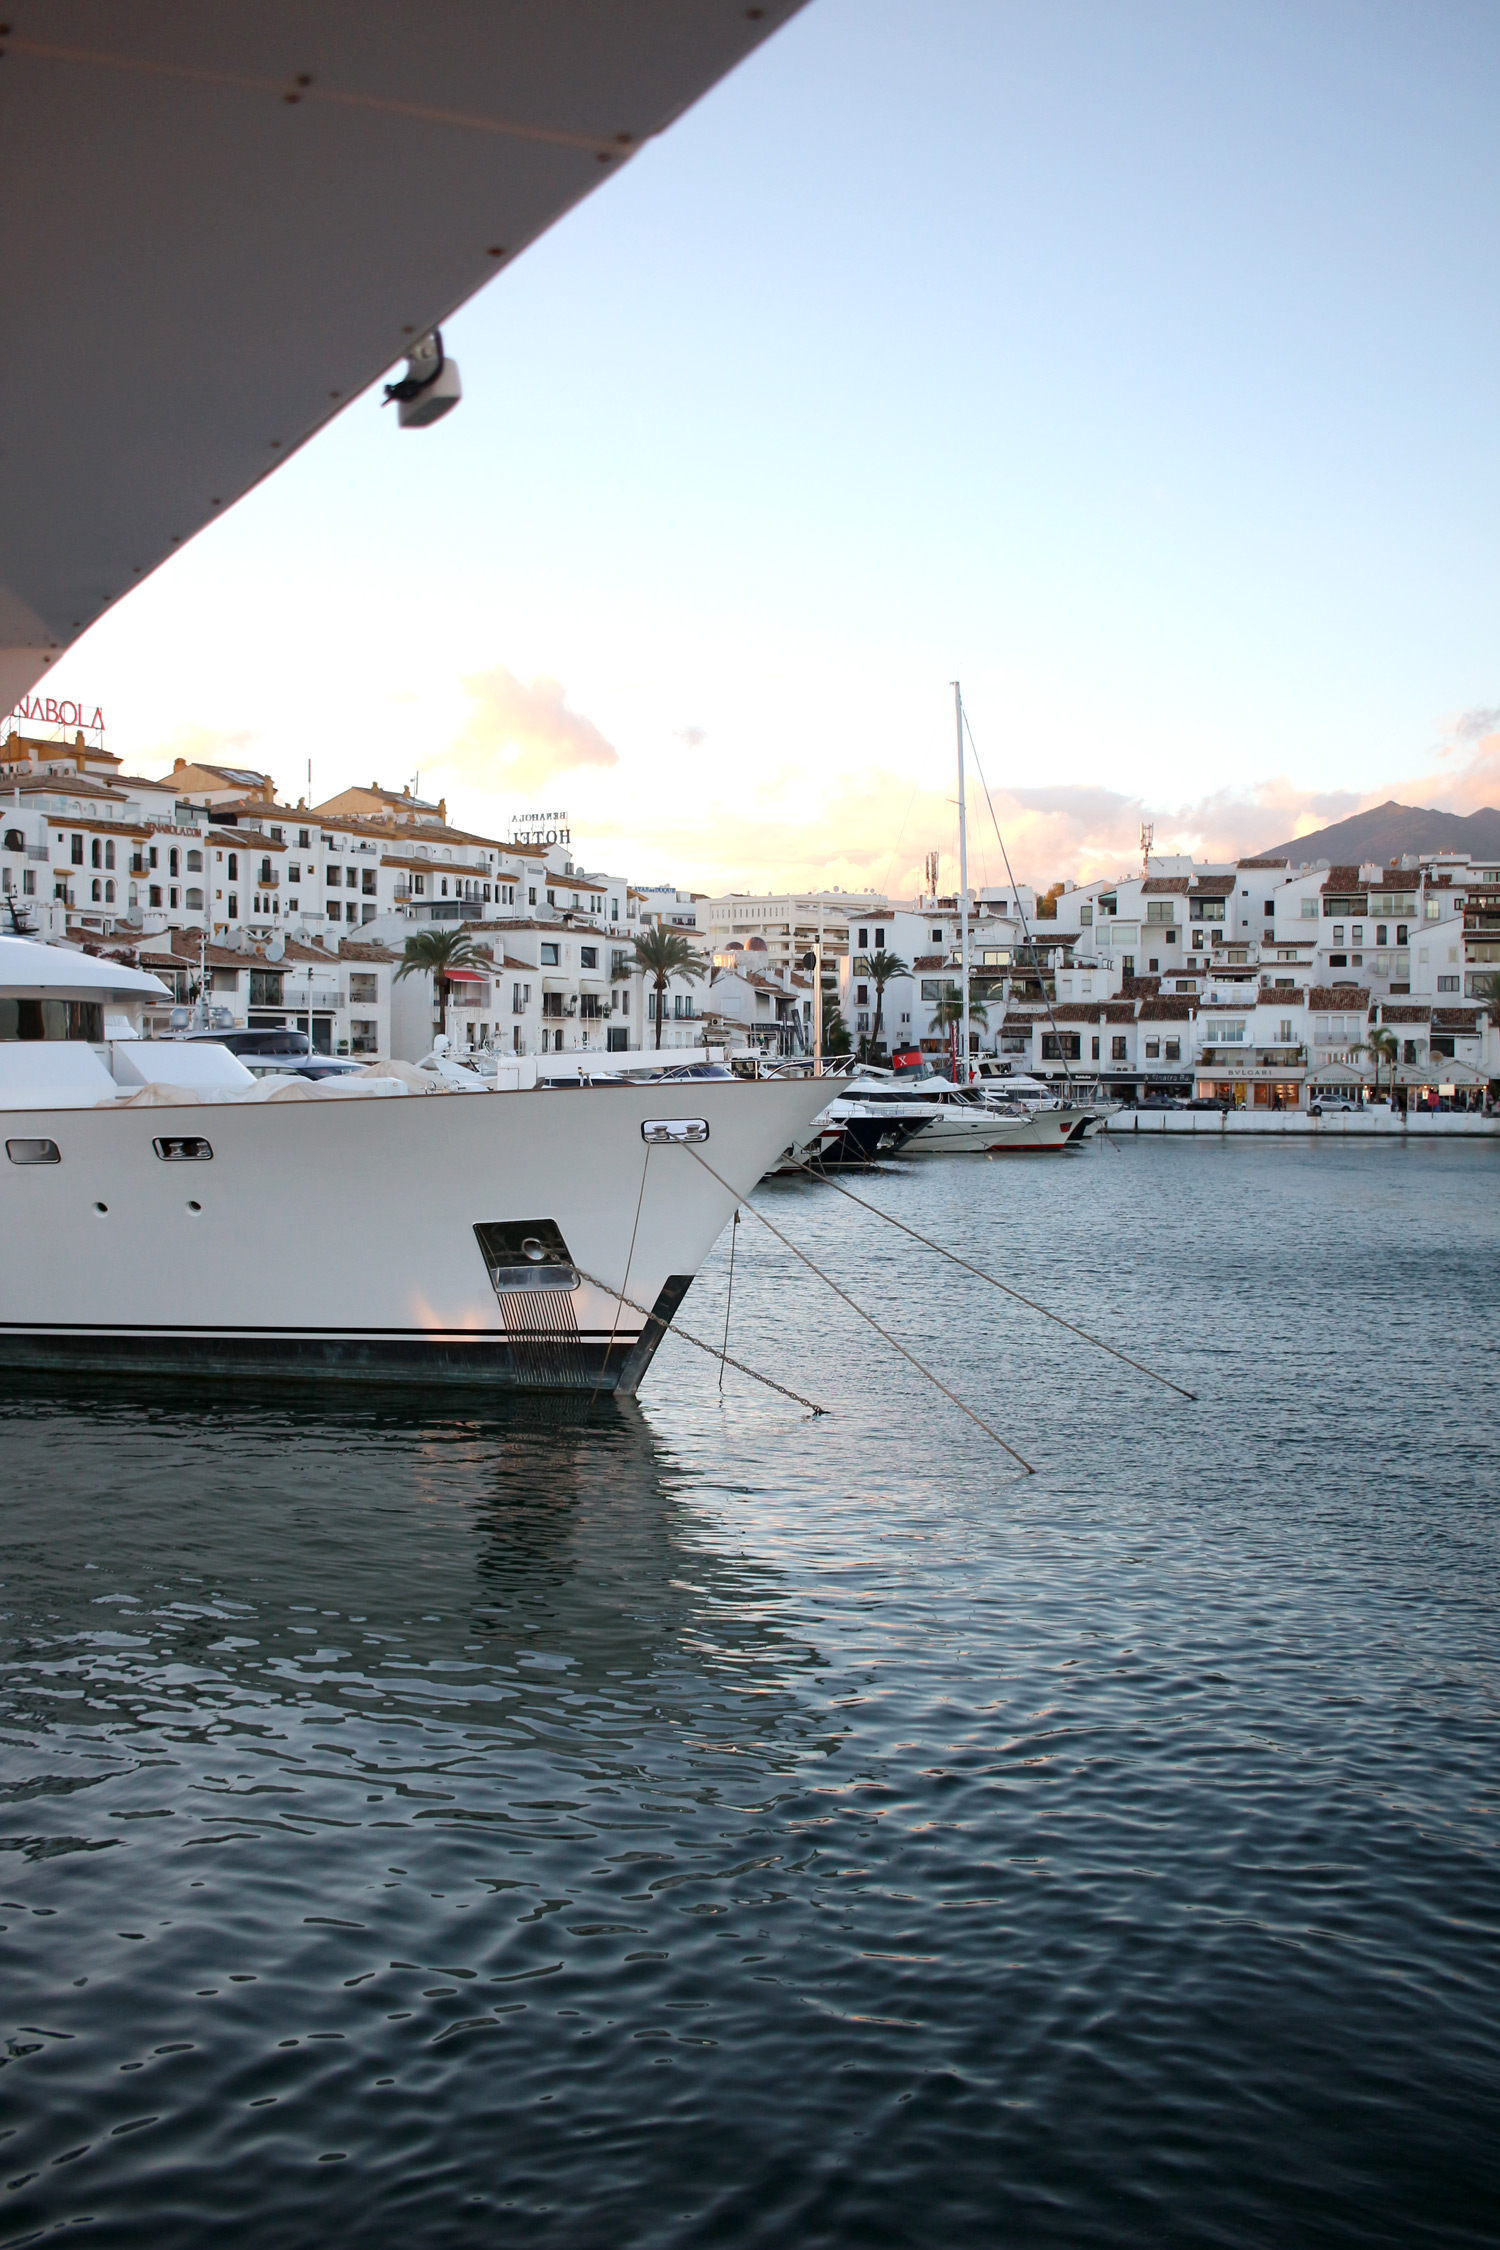 marbella-malaga-spain-travel-blogger-Puerto-Banus-7